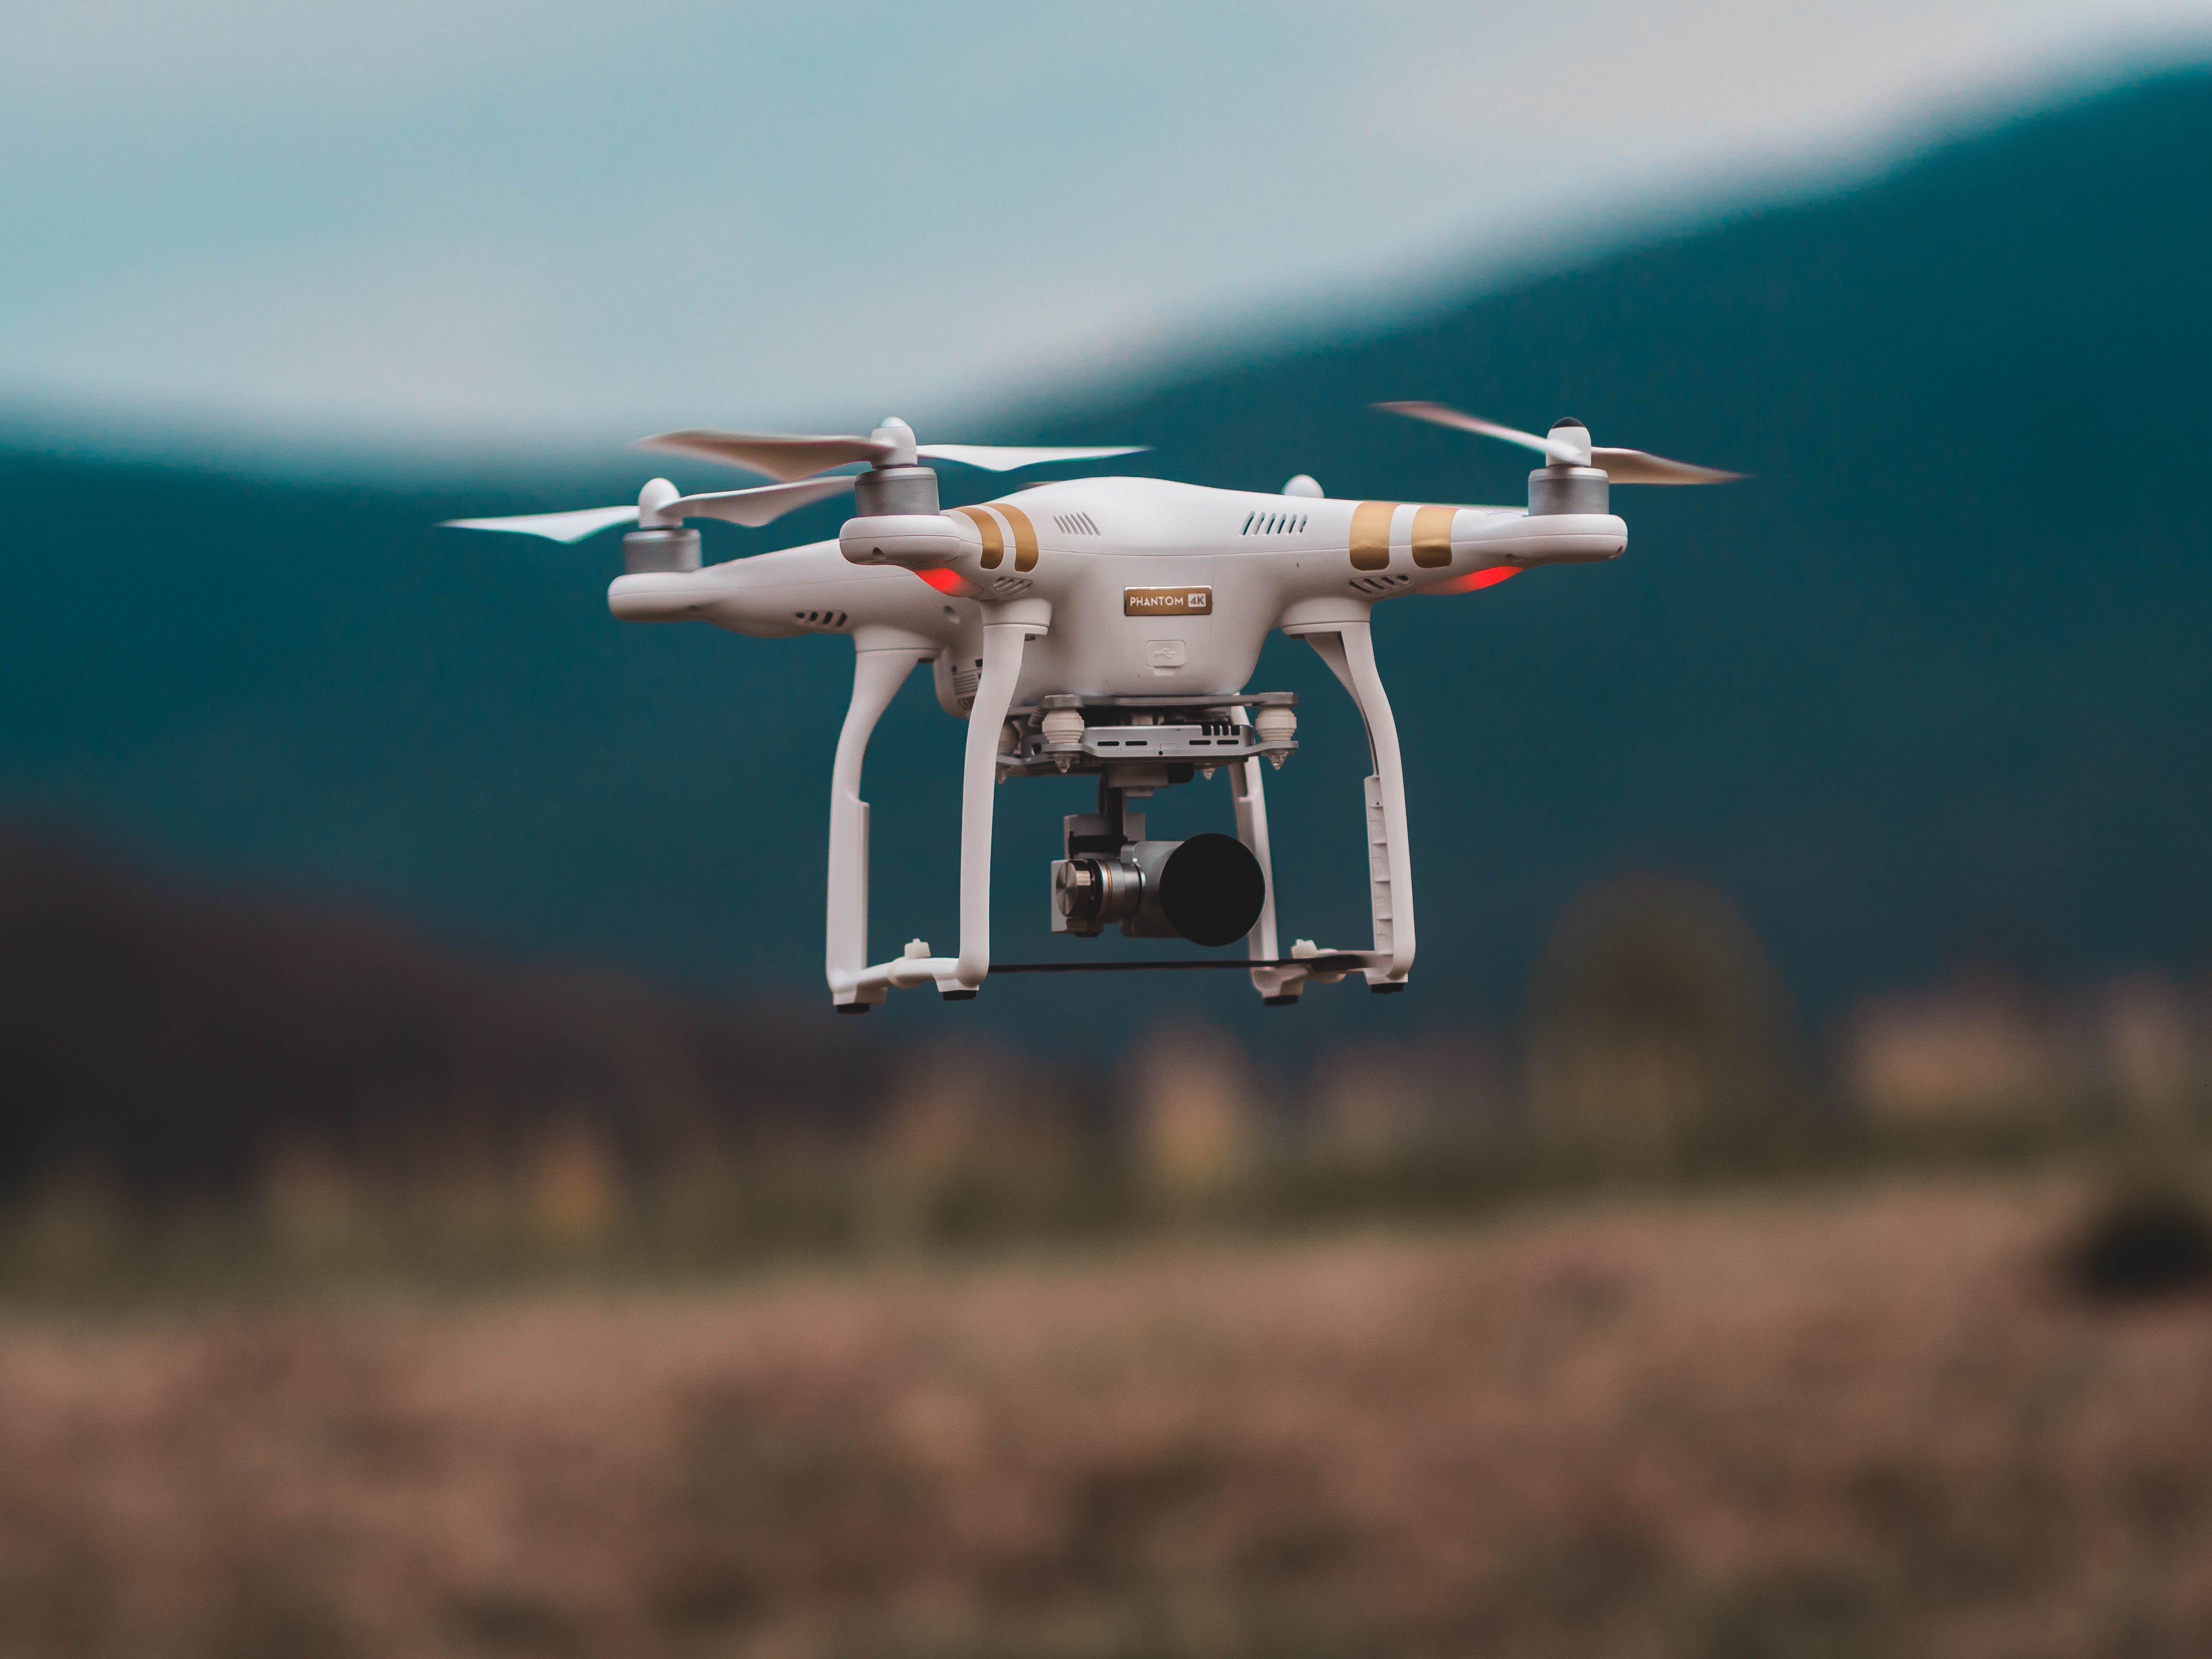 German Civil Aviation Authorities approves the ProctorExam platform